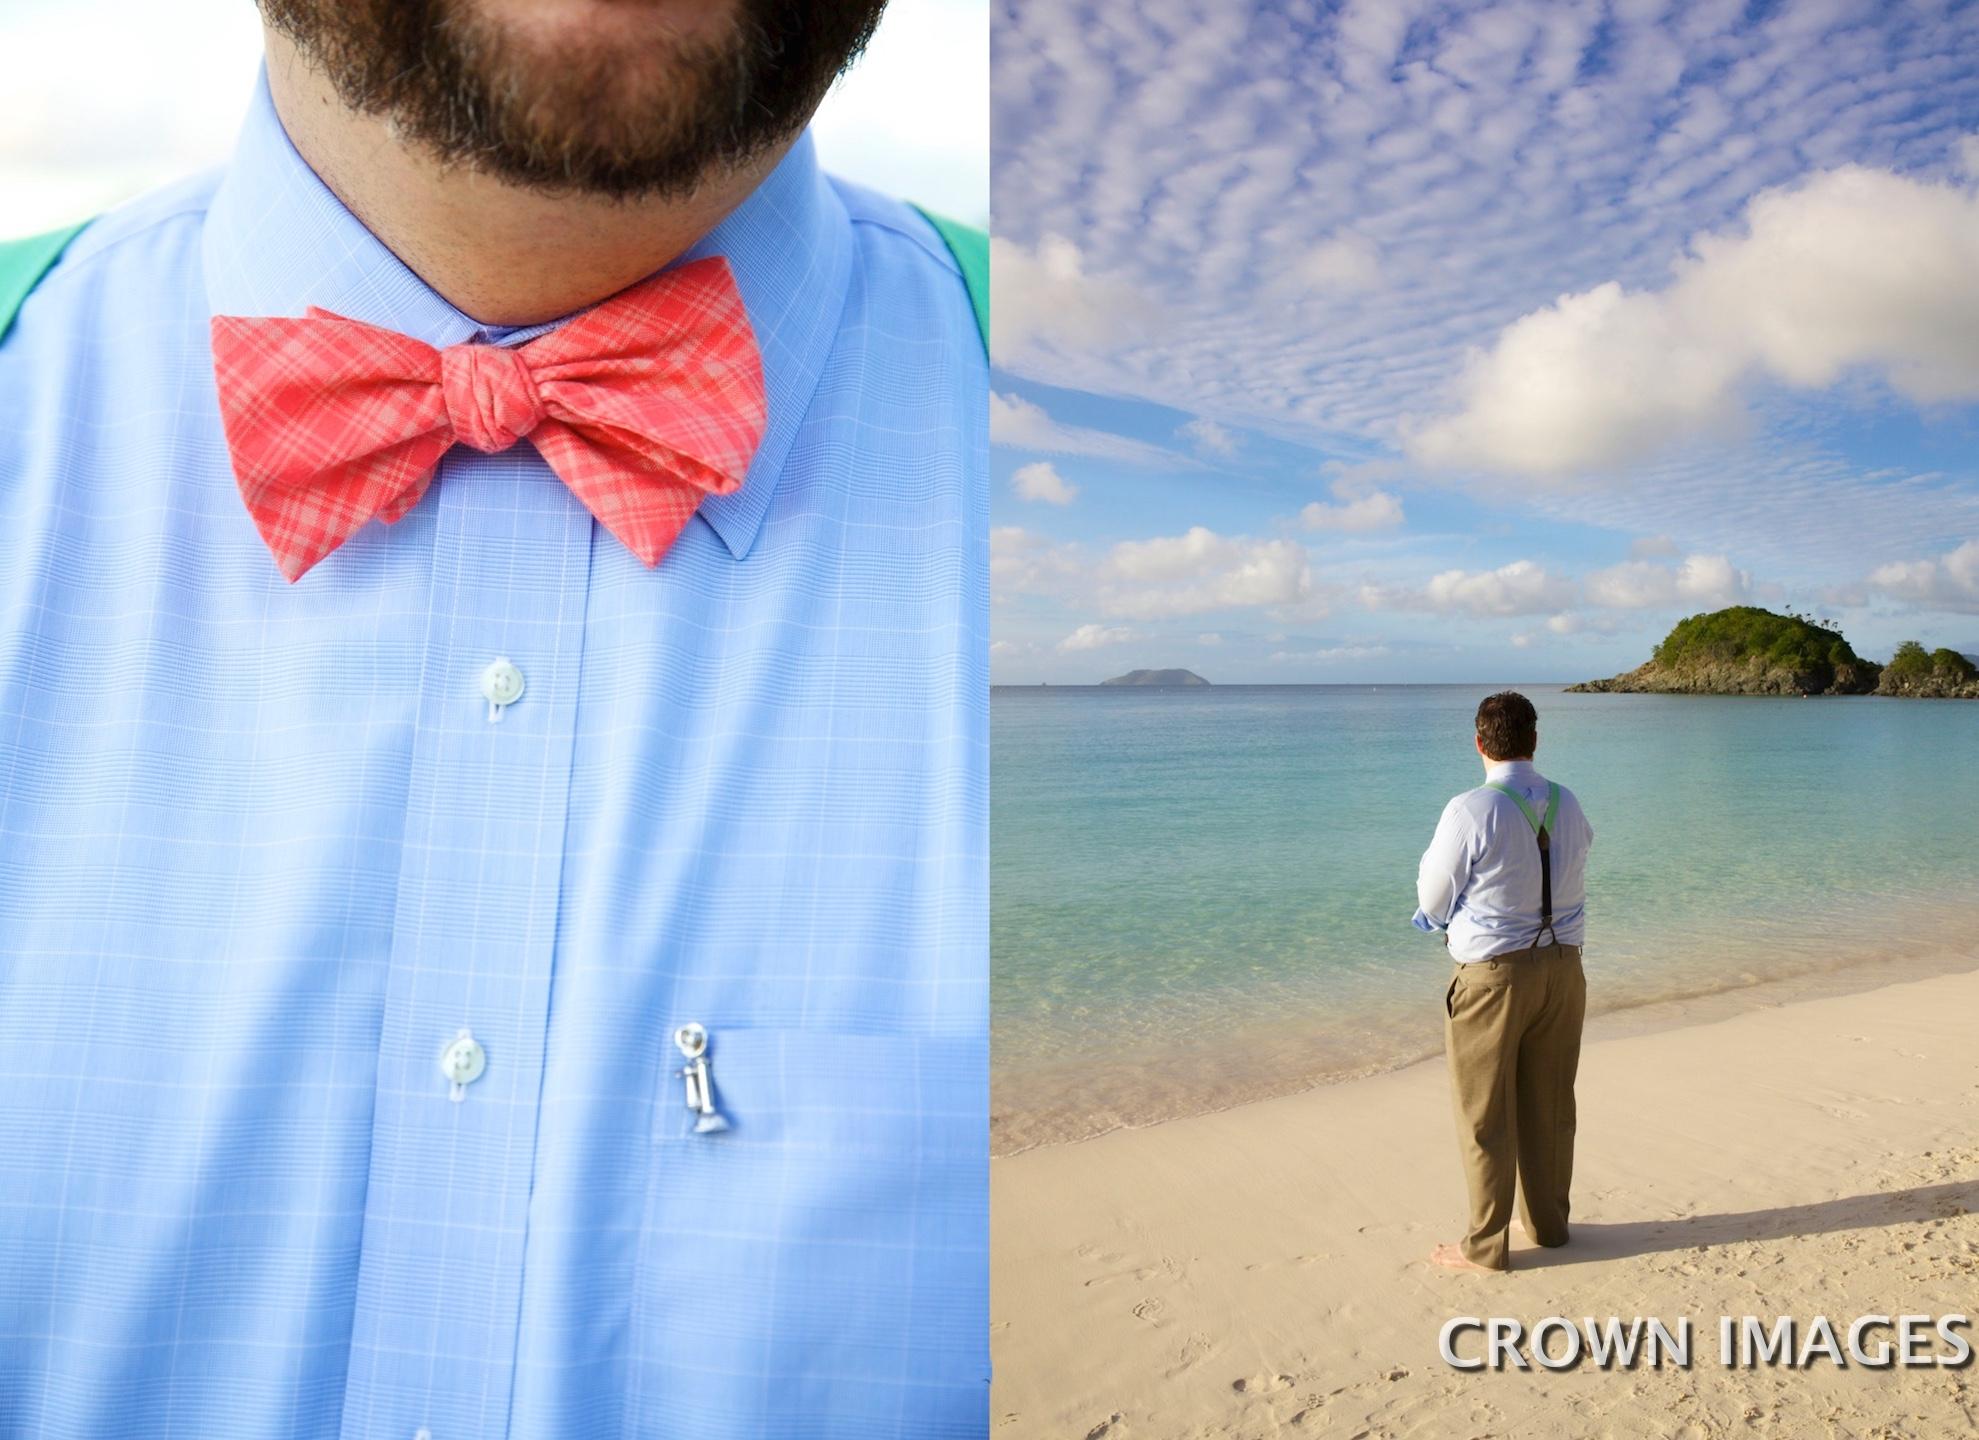 grooms attire for a beach wedding